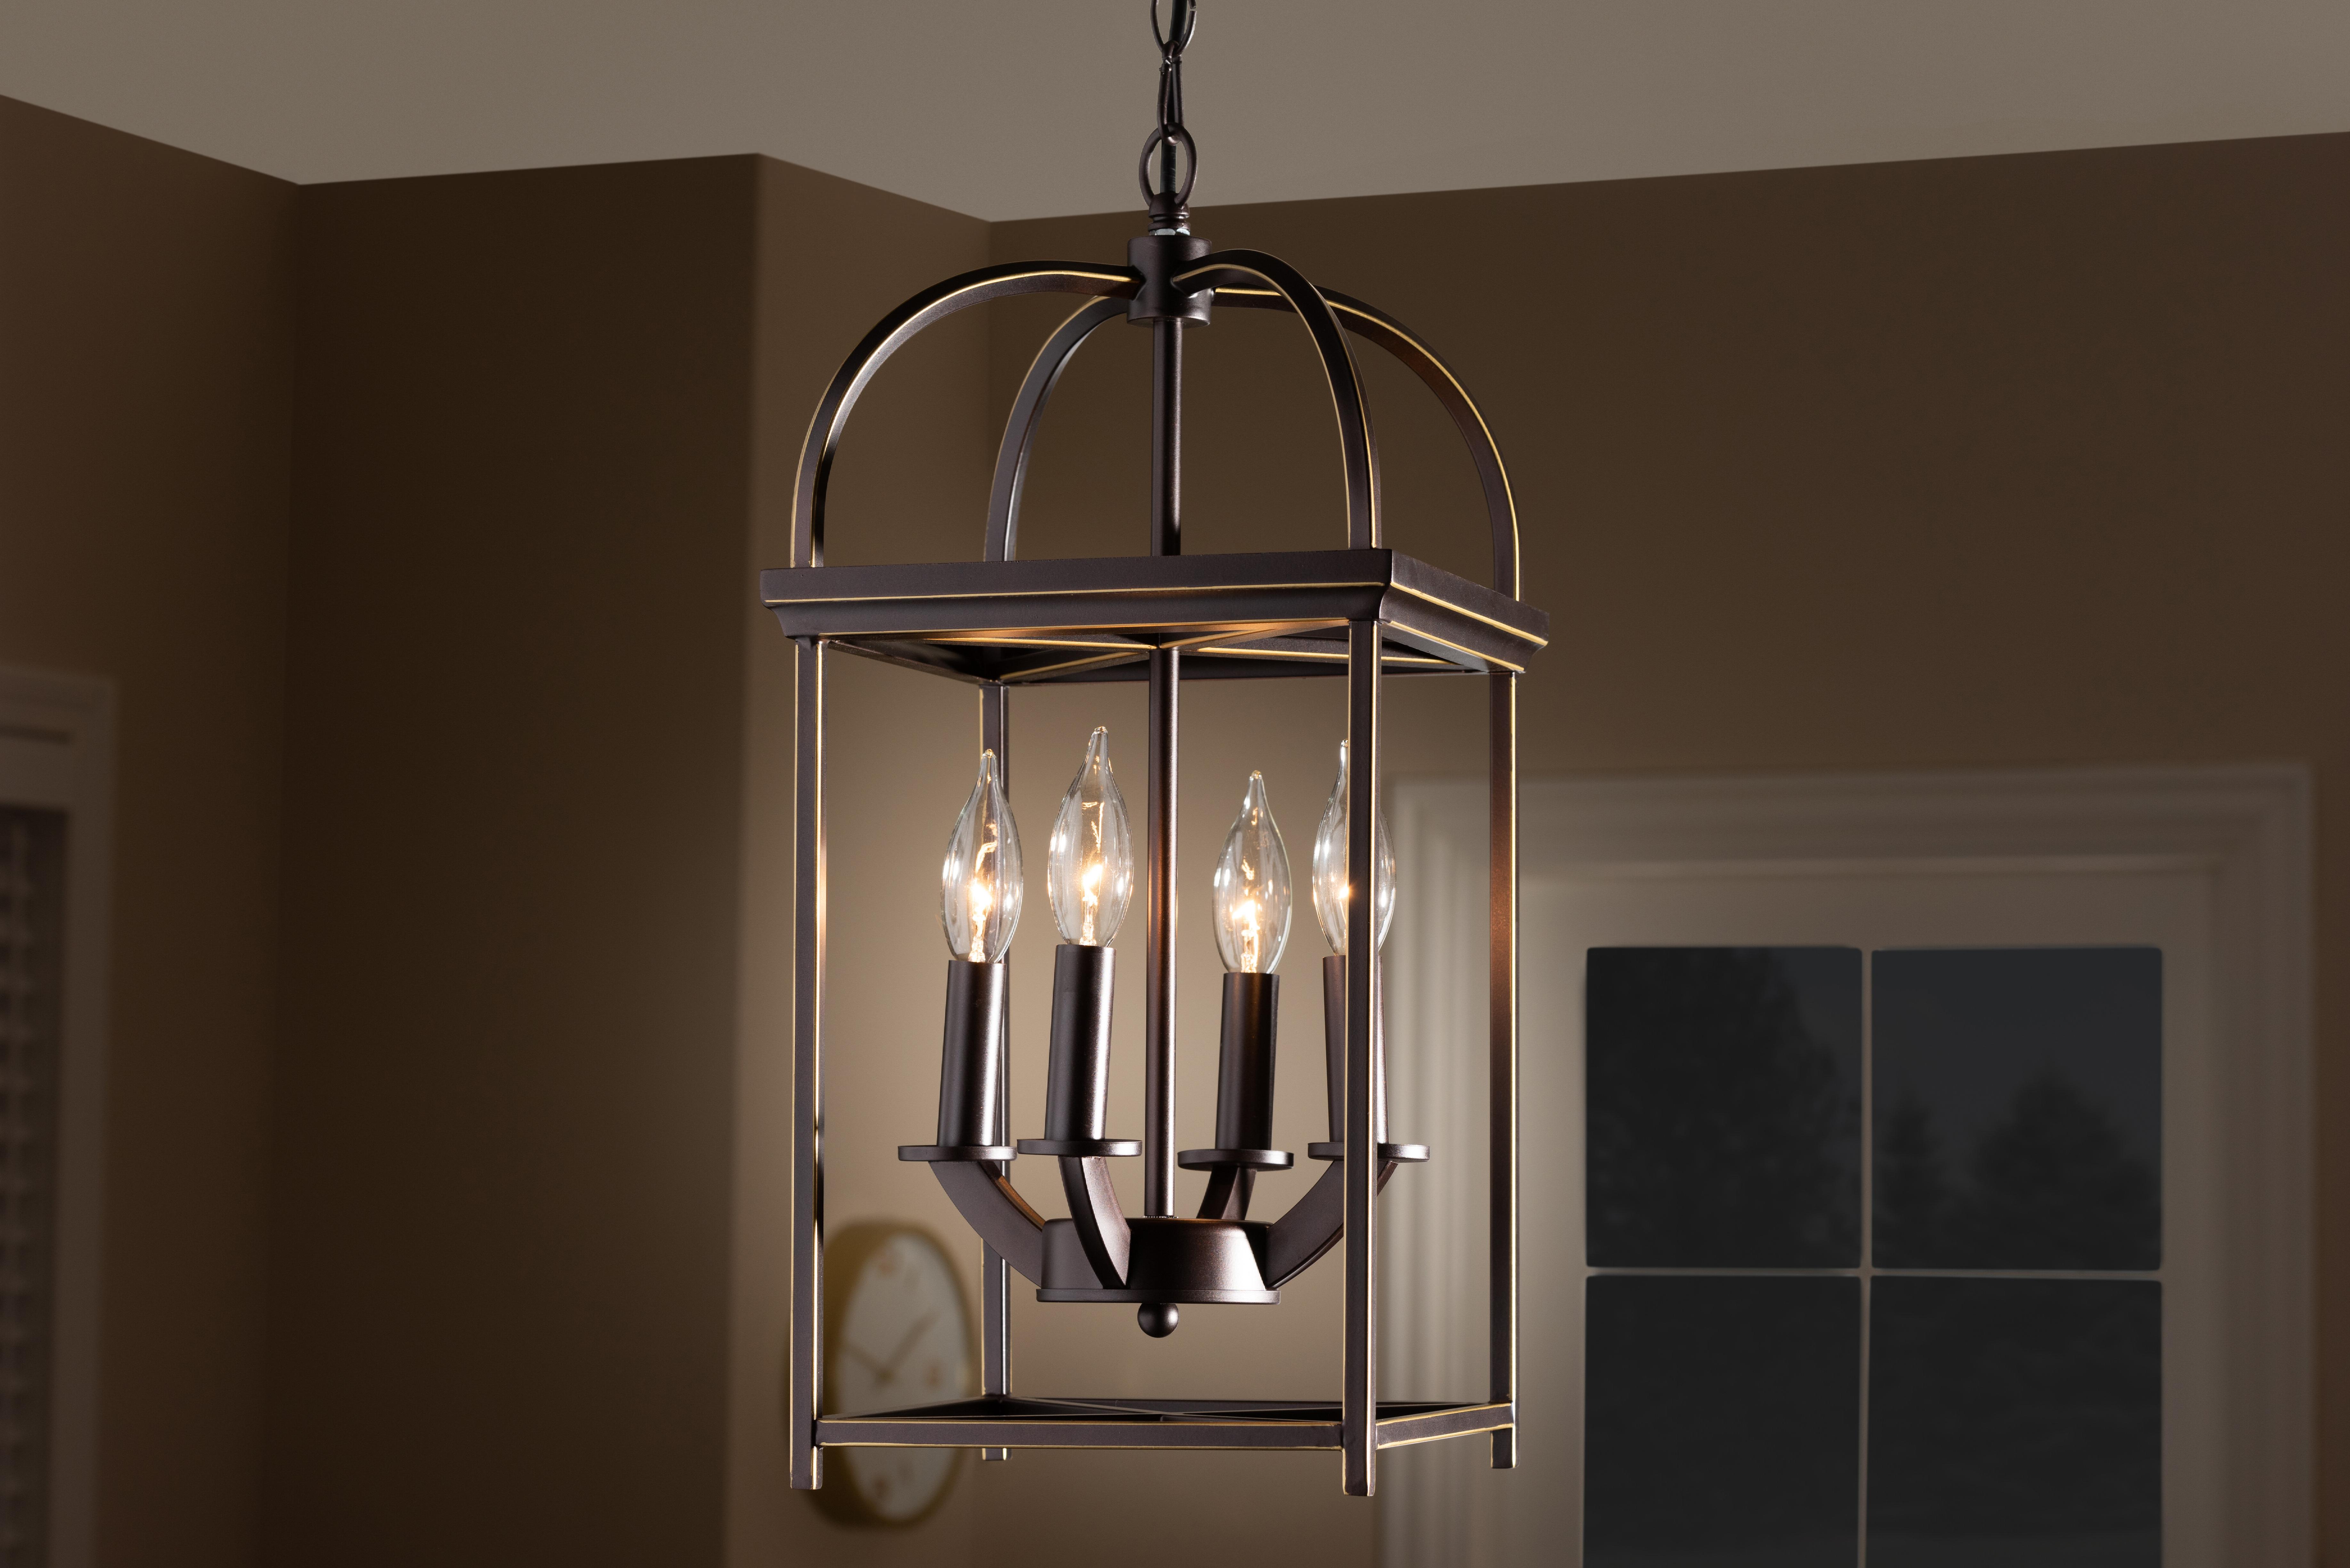 Current Freeburg 4 Light Lantern Square / Rectangle Pendants In Ashley 4 Light Mini Chandelier (View 3 of 20)